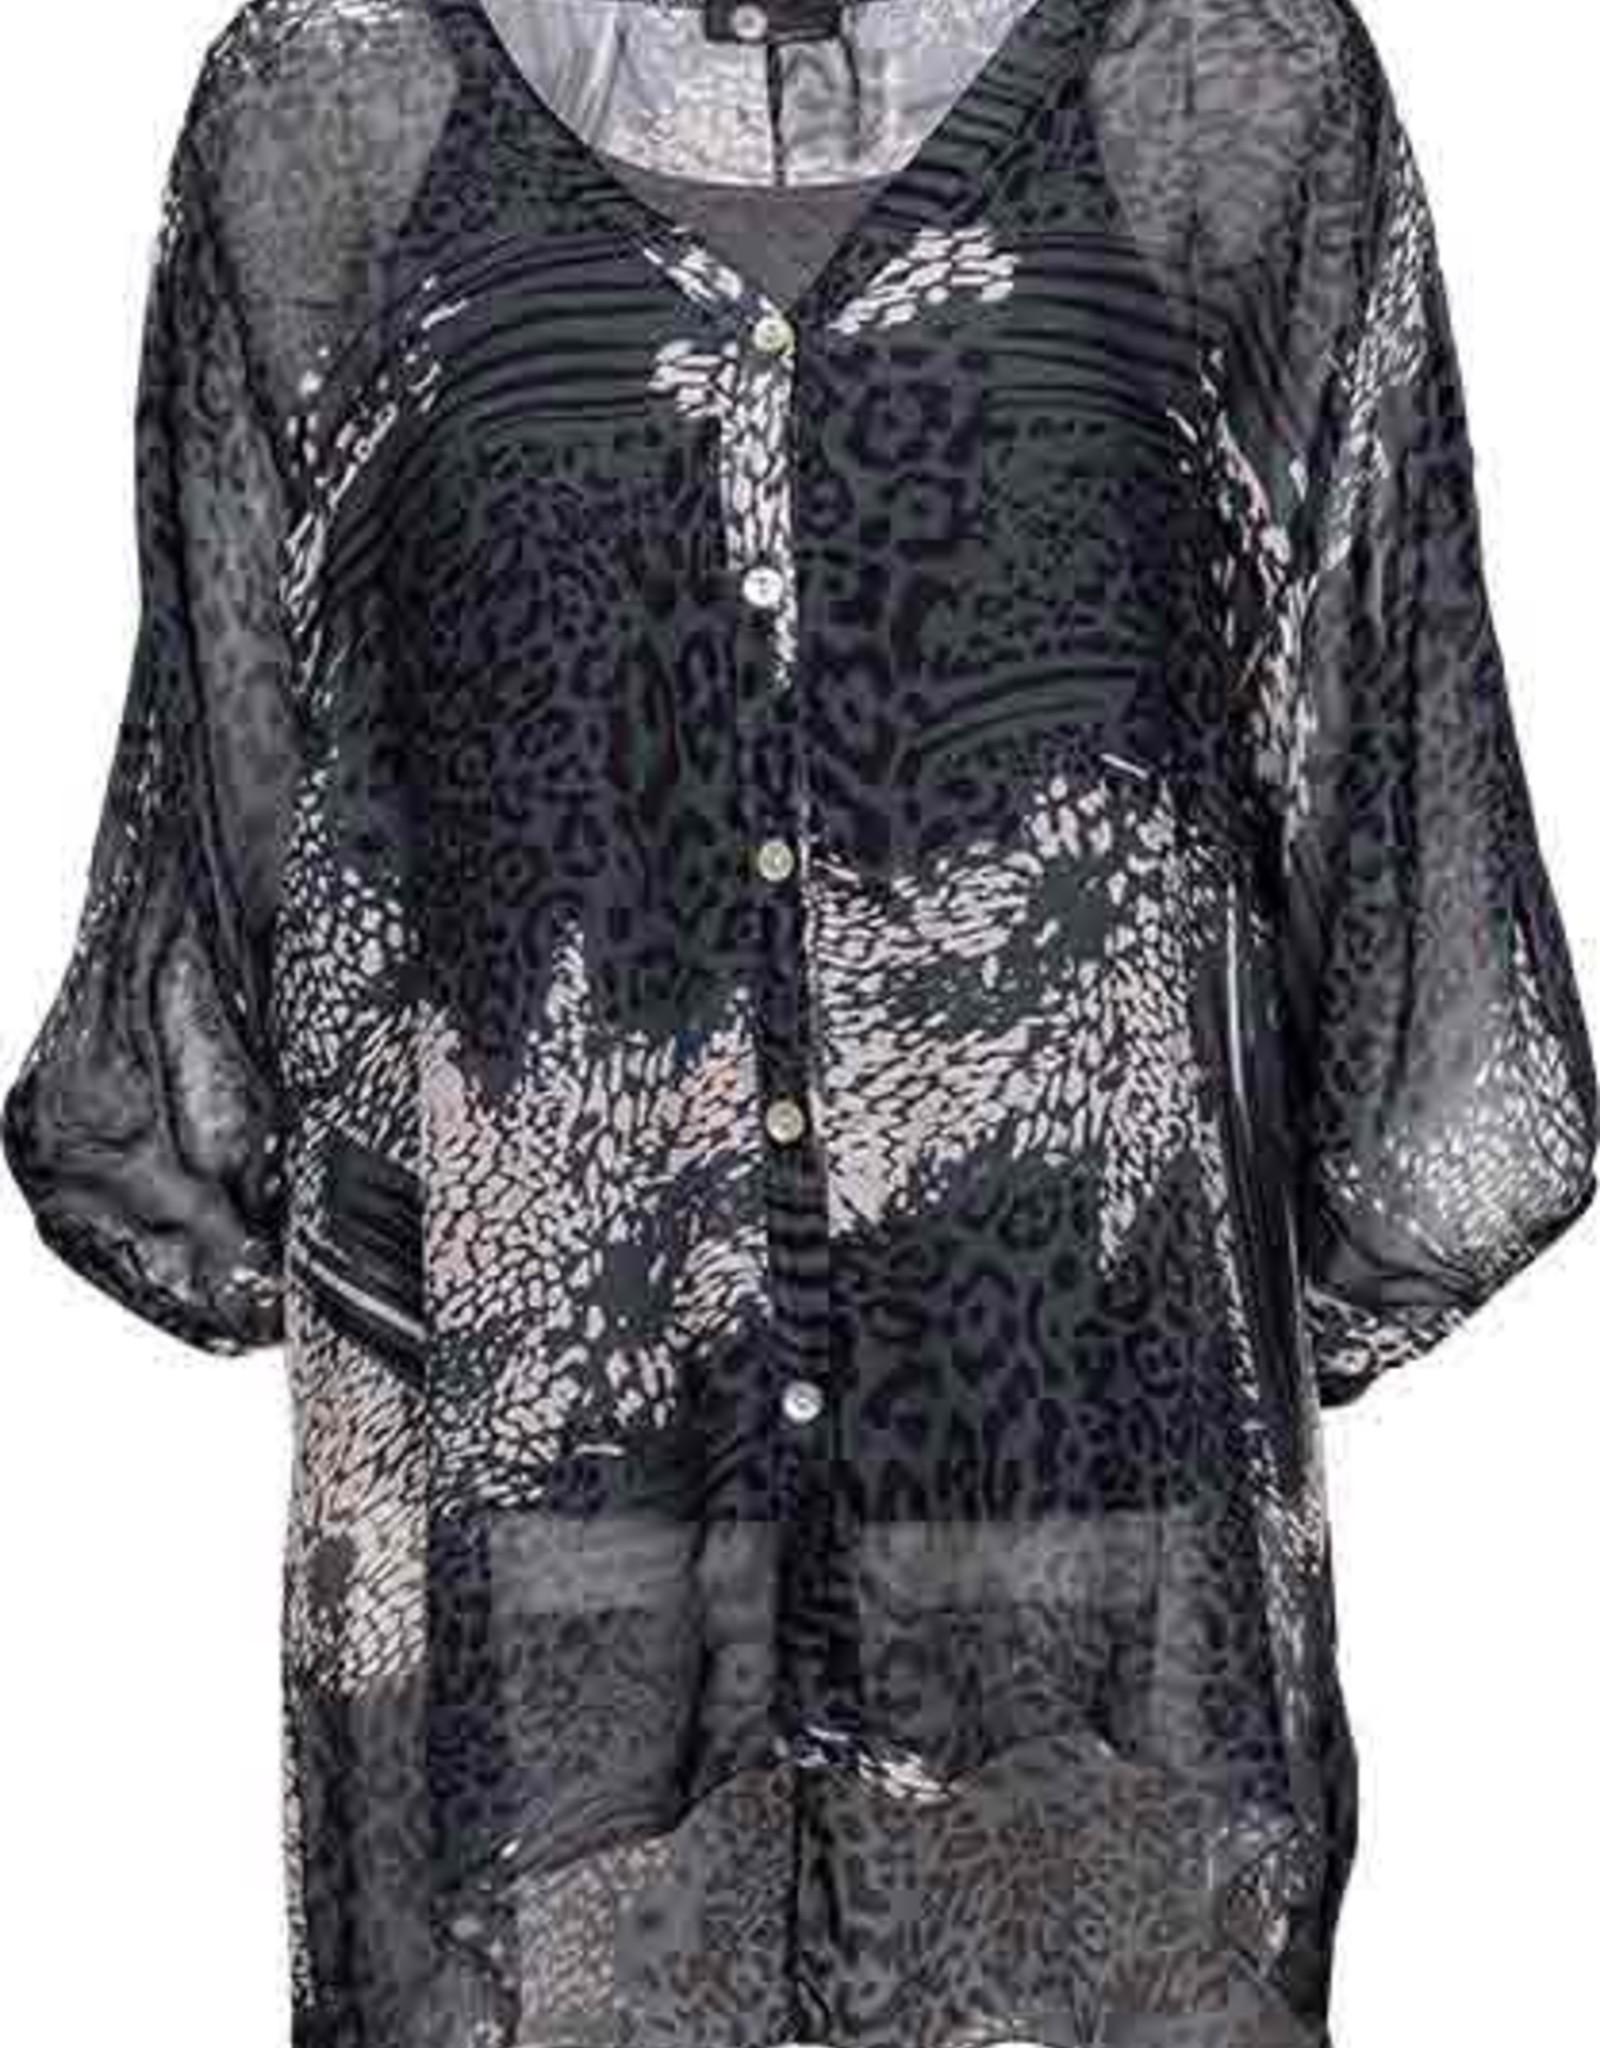 M Made in Italy  Silk Print Tunic